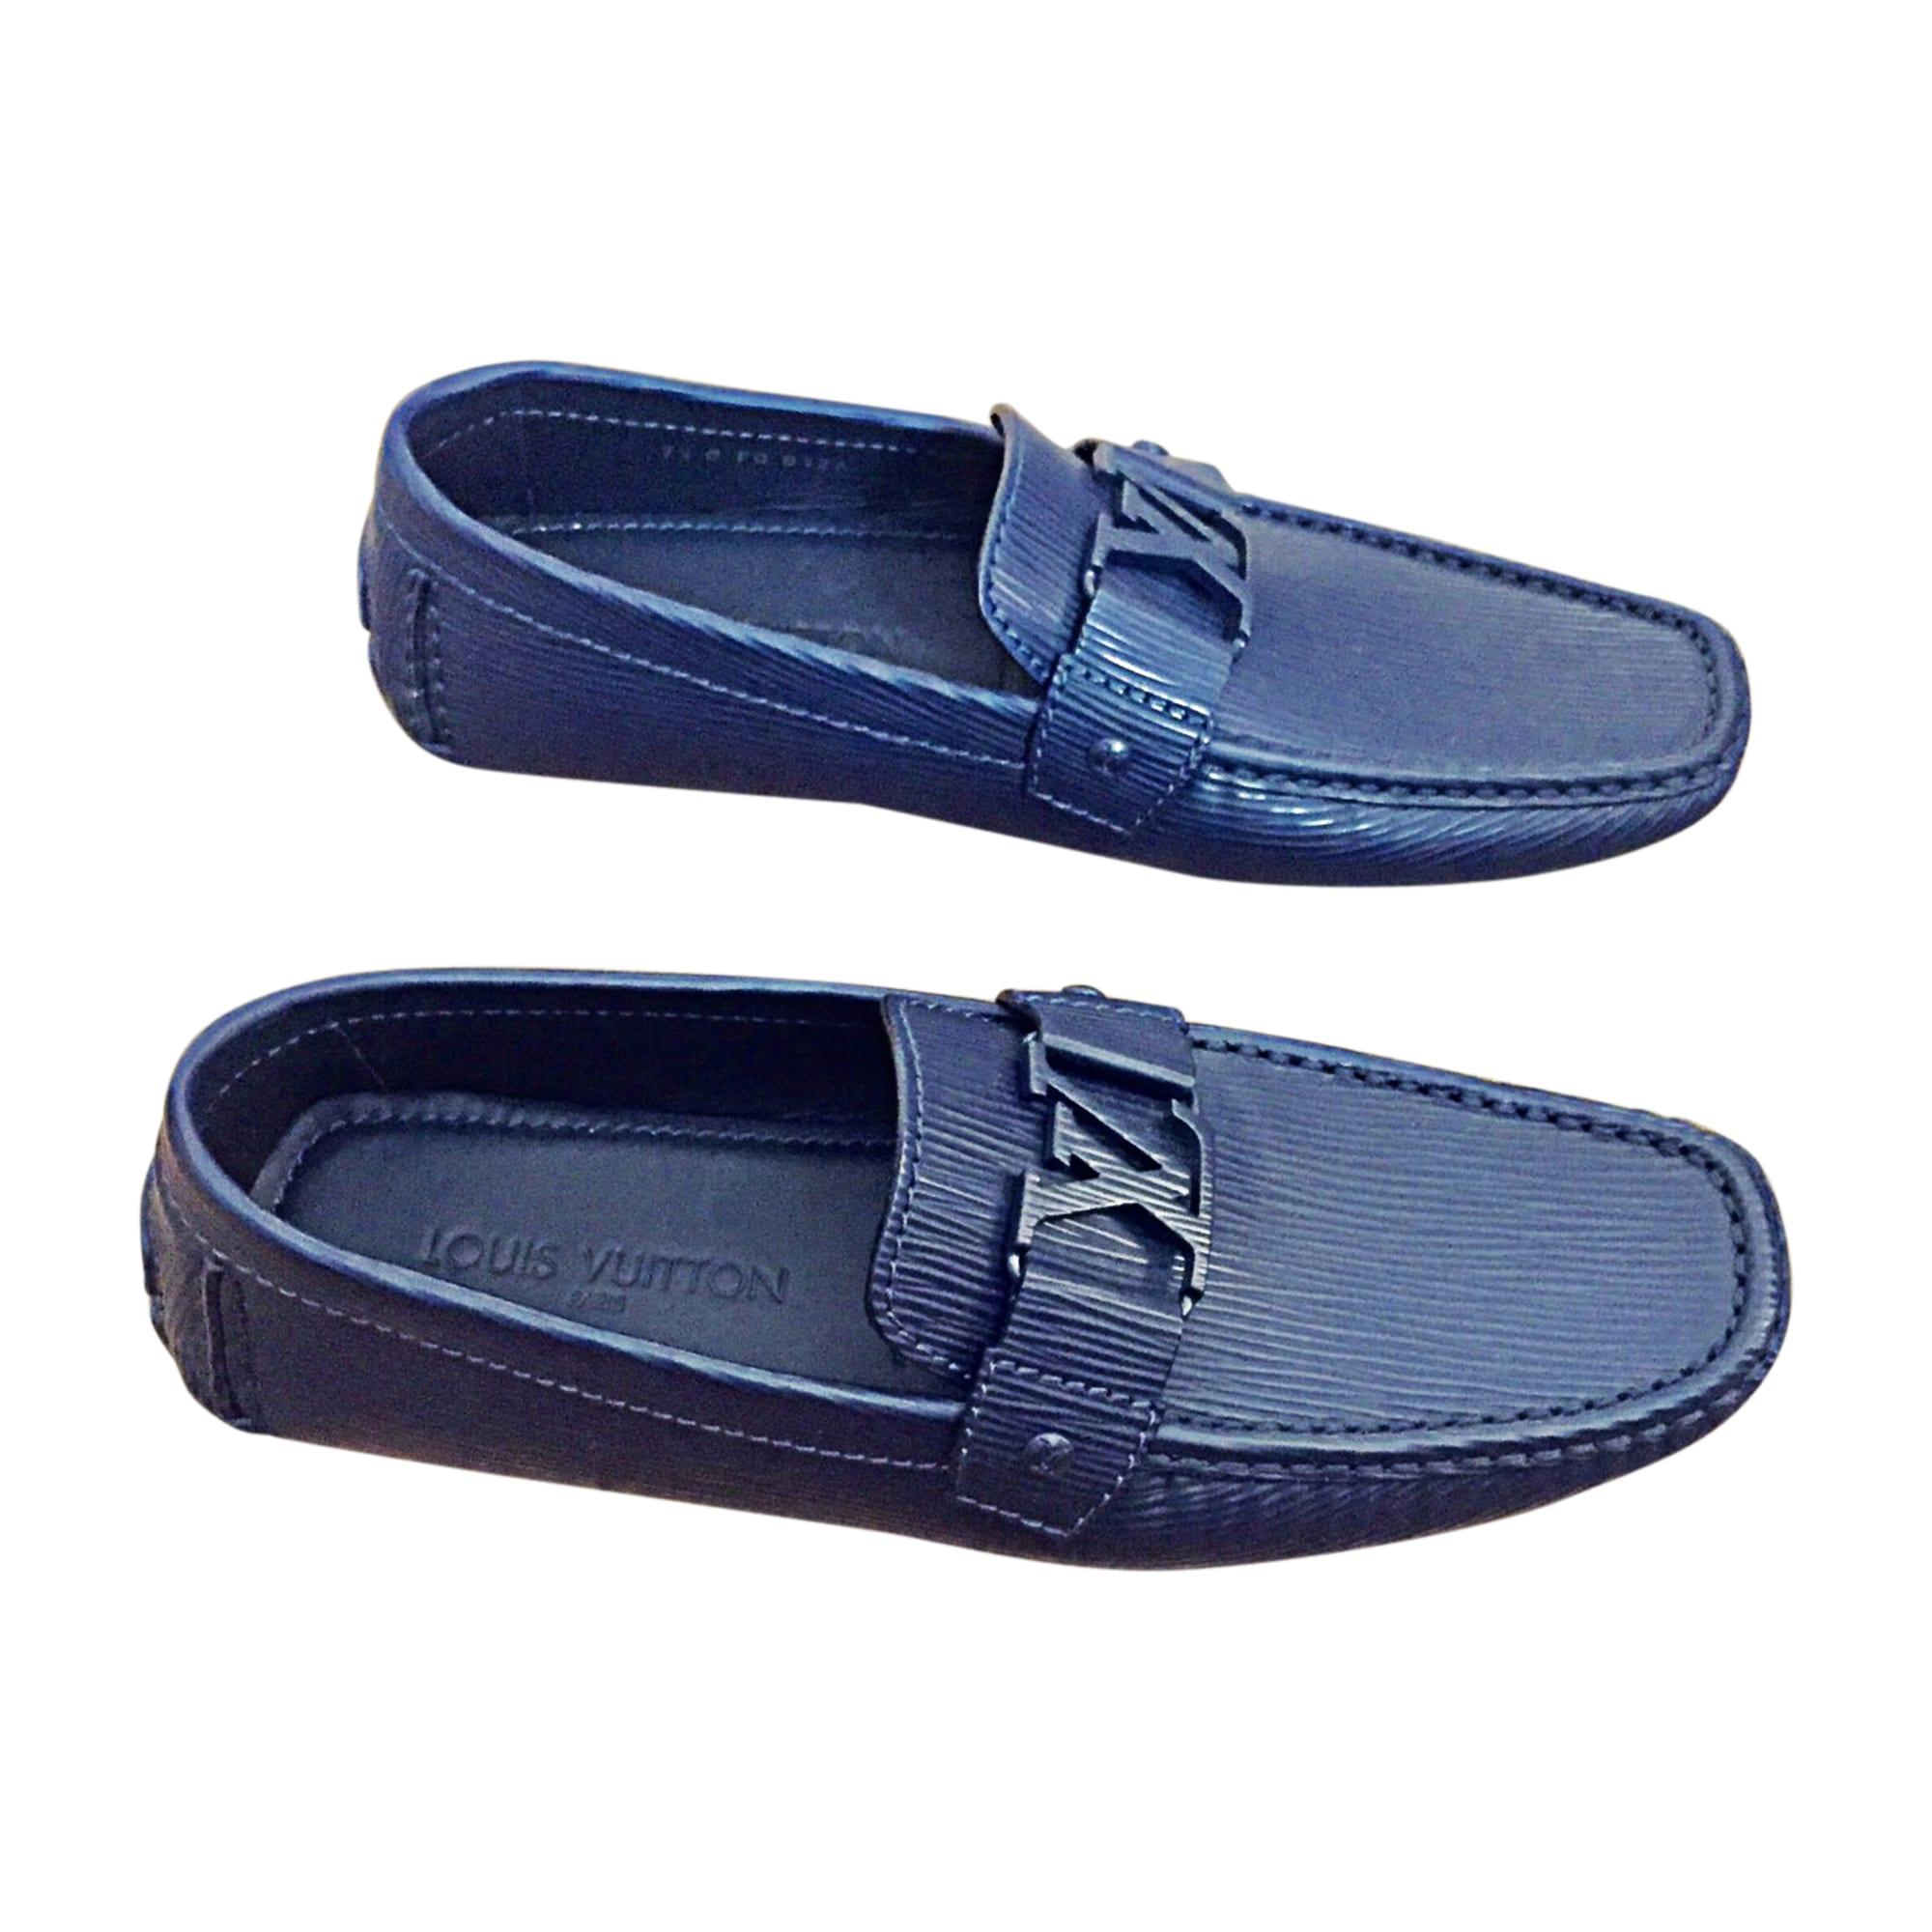 Loafers LOUIS VUITTON 41,5 blue - 7893712